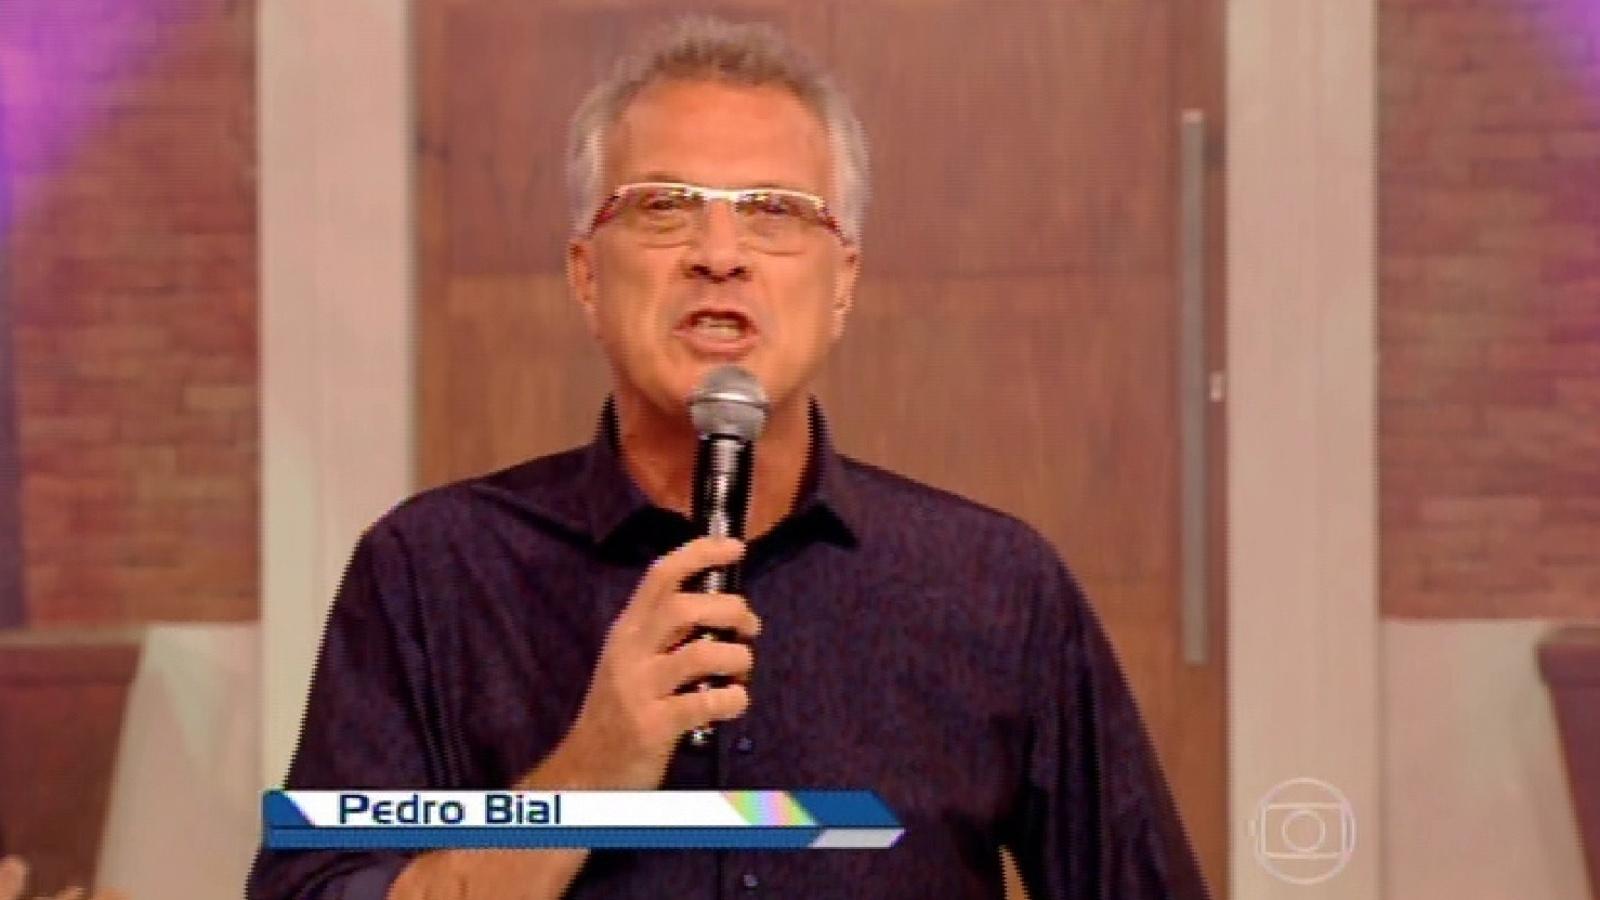 31.mar.2015 - Pedro Bial dá início ao programa desta terça-feira